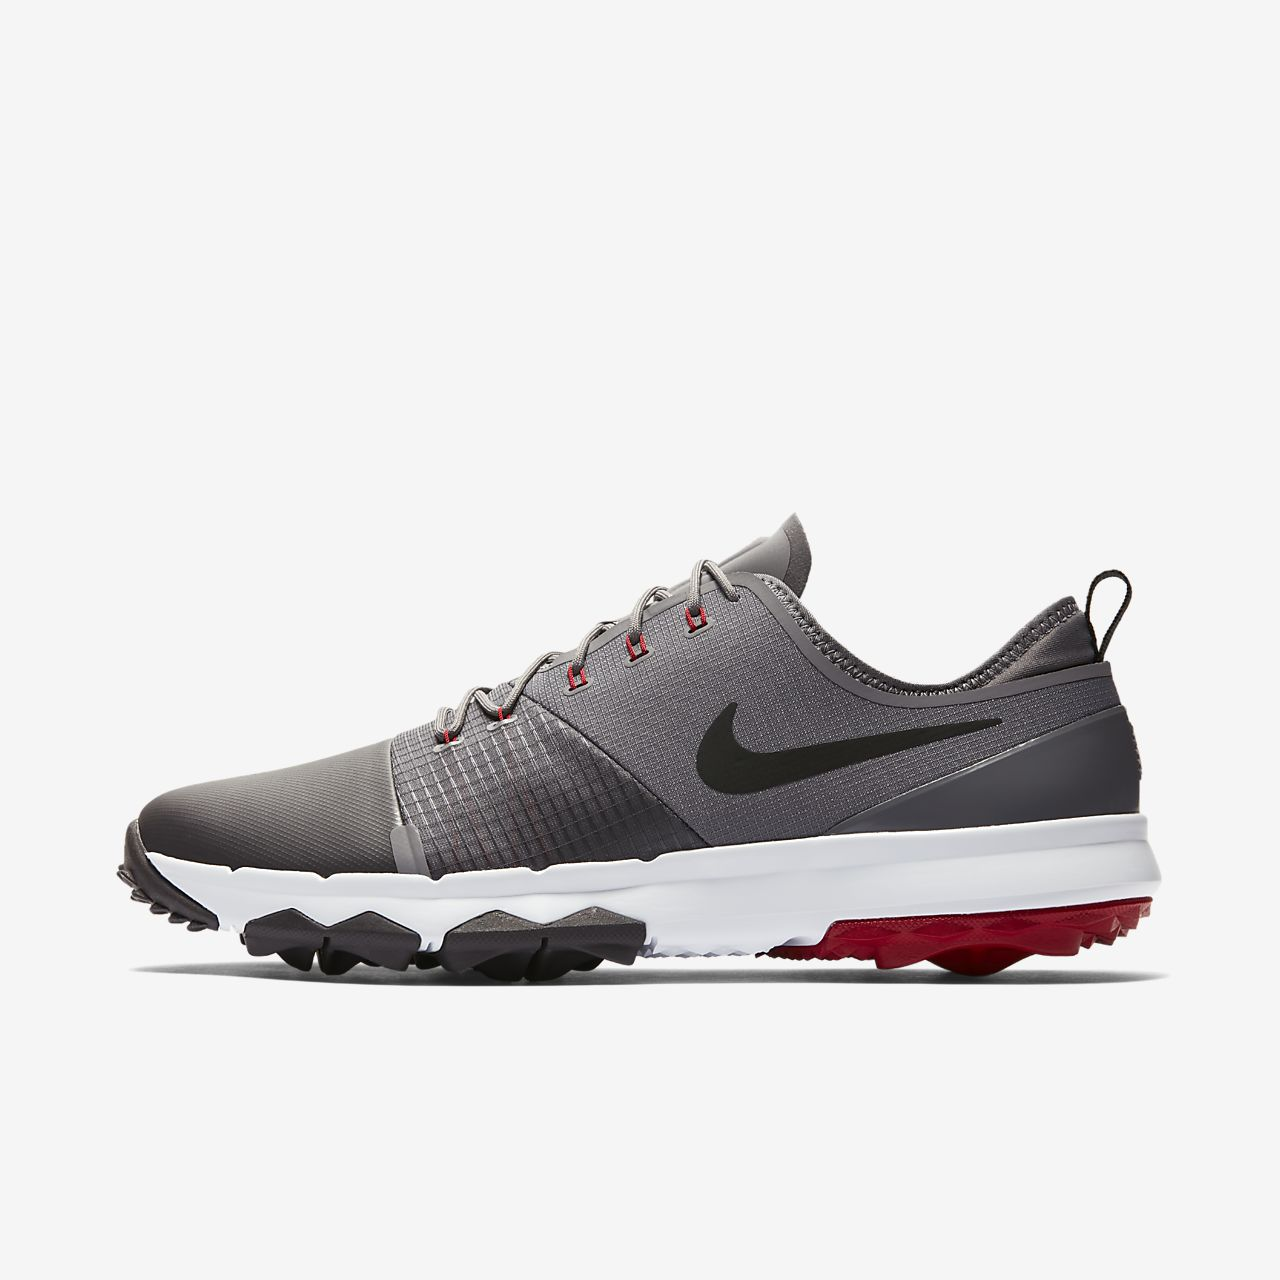 eb35a601023f6 Scarpa da golf Nike FI Impact 3 - Uomo. Nike.com CH